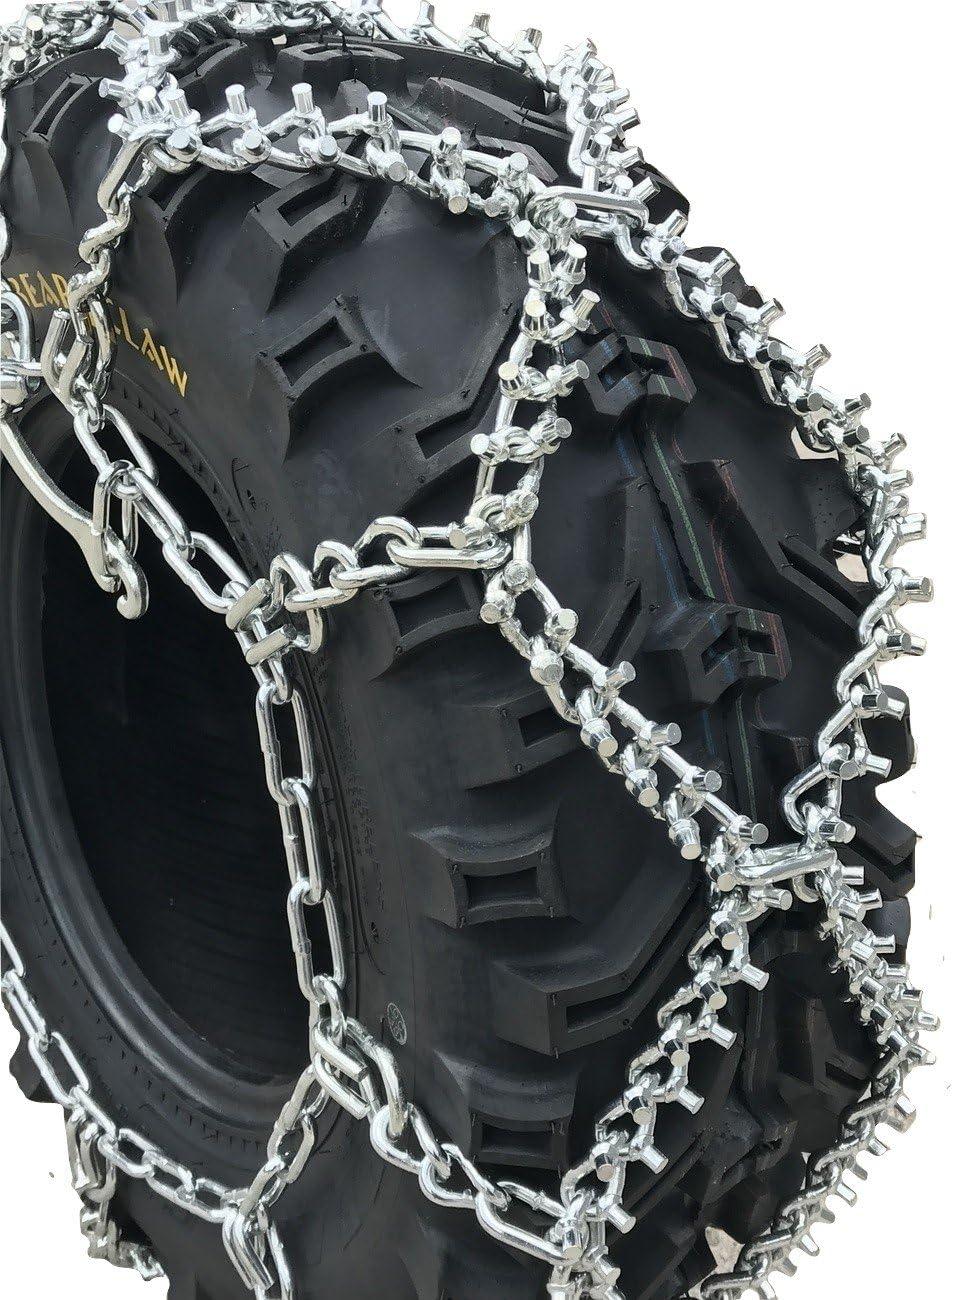 26 8 12 ATV UTV Stud Tire Chains Priced per Pair TireChain.com 26x8-12